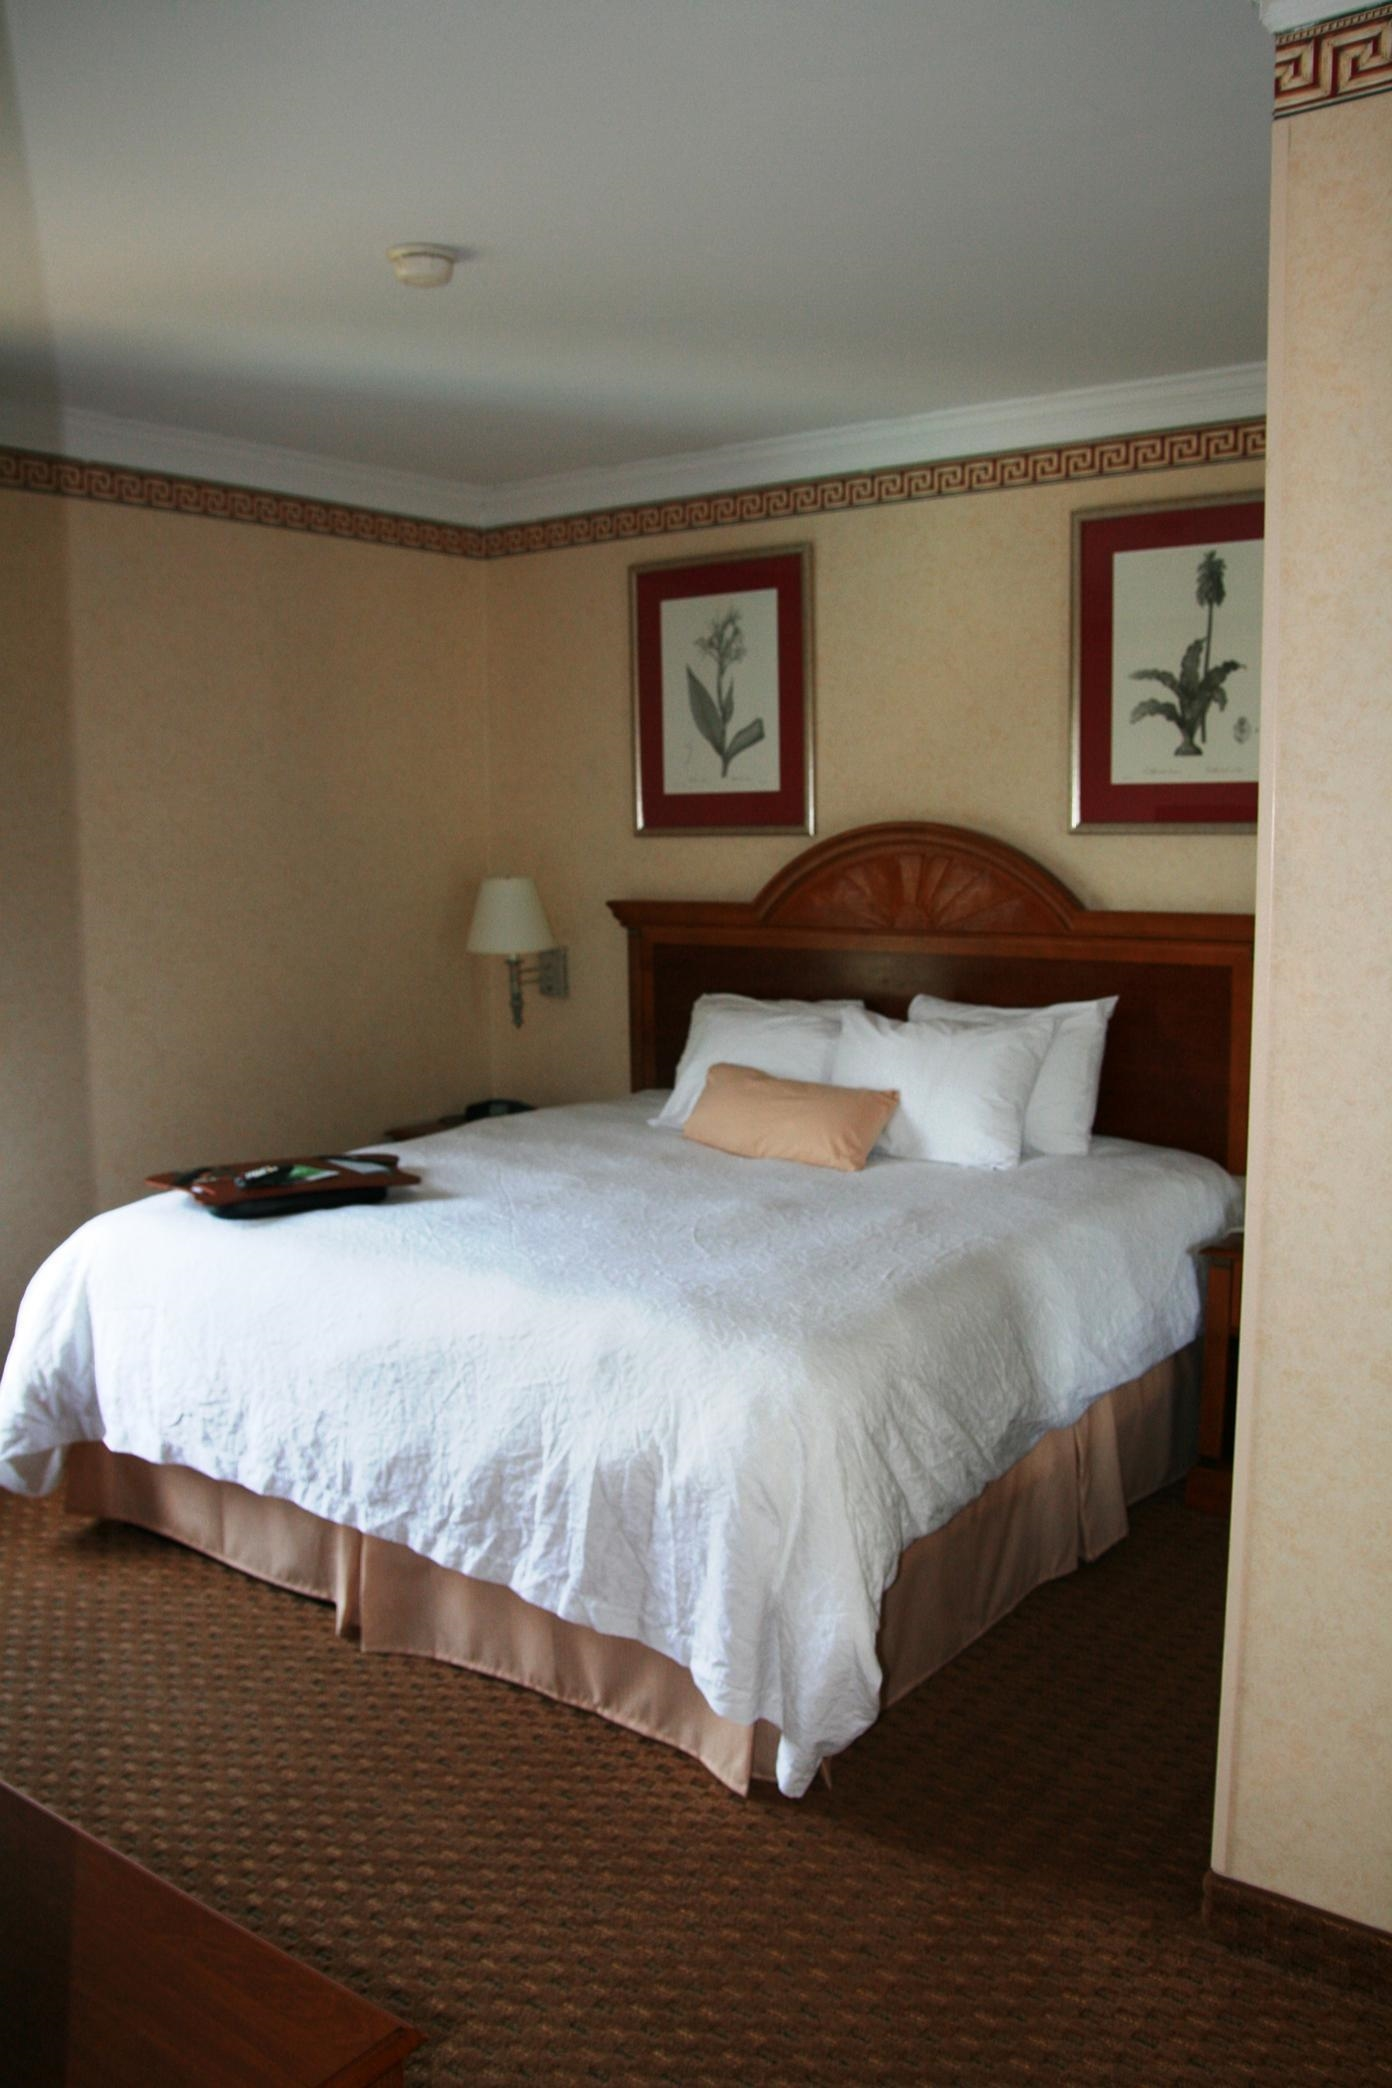 Hotels & Motels in North Charleston, SC | North Charleston South ...